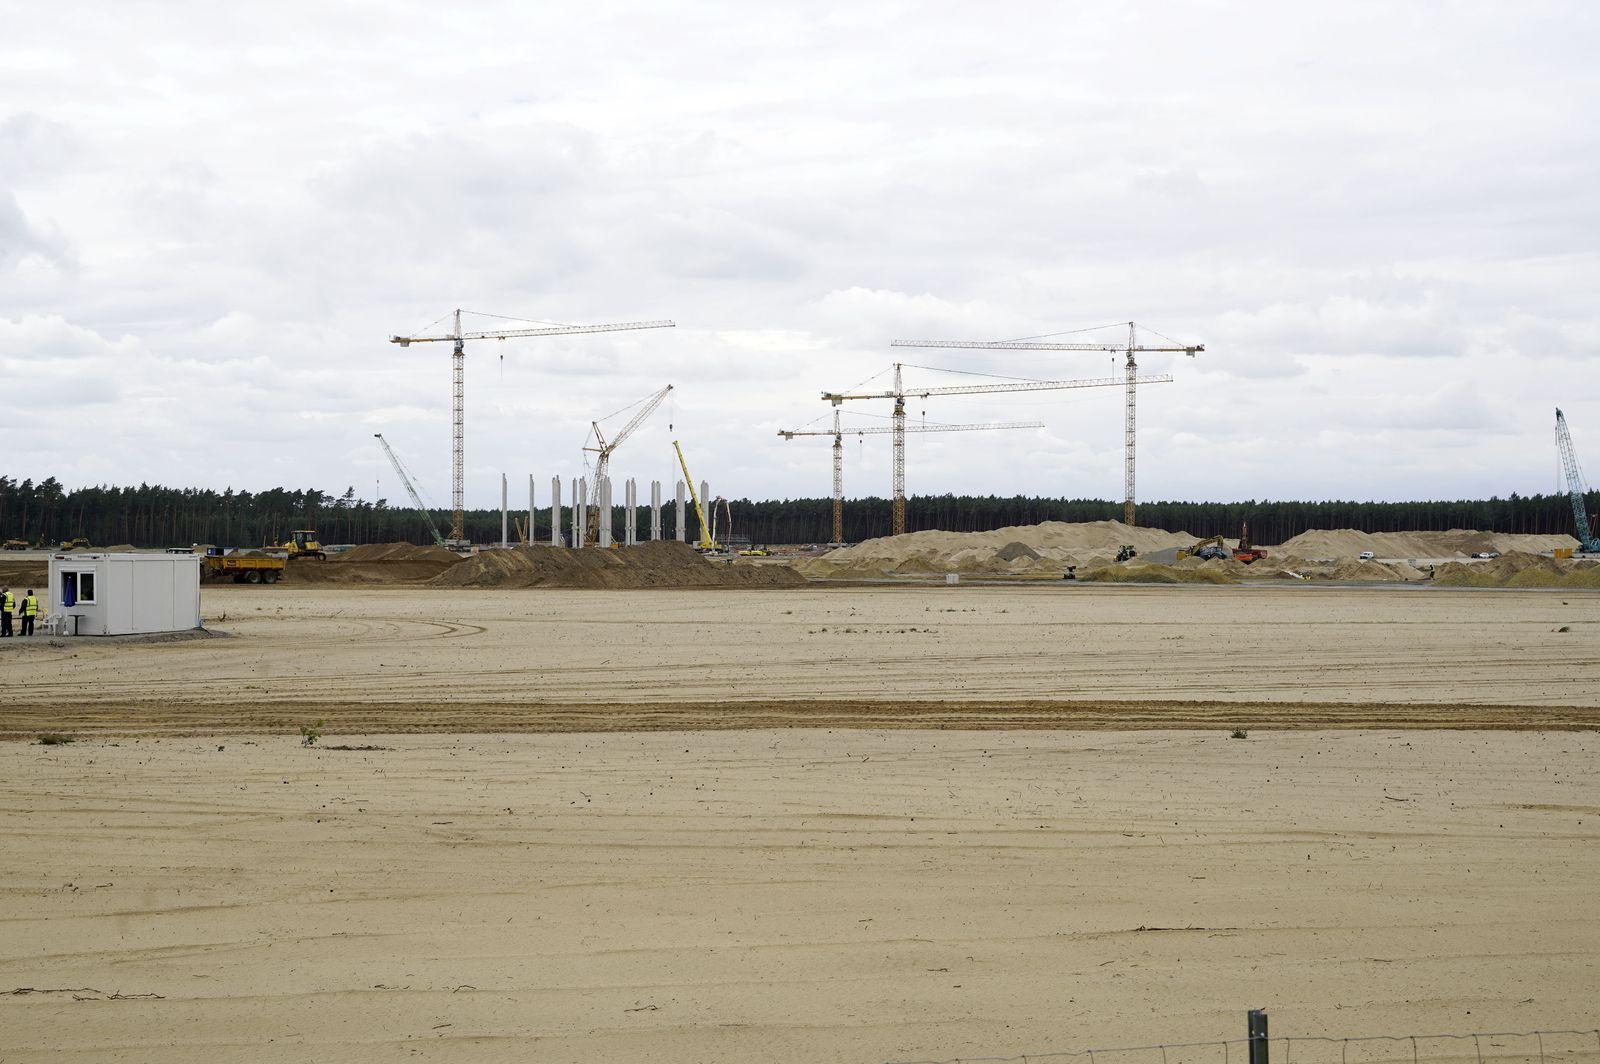 Baugelände der Tesla Gigafactory 4